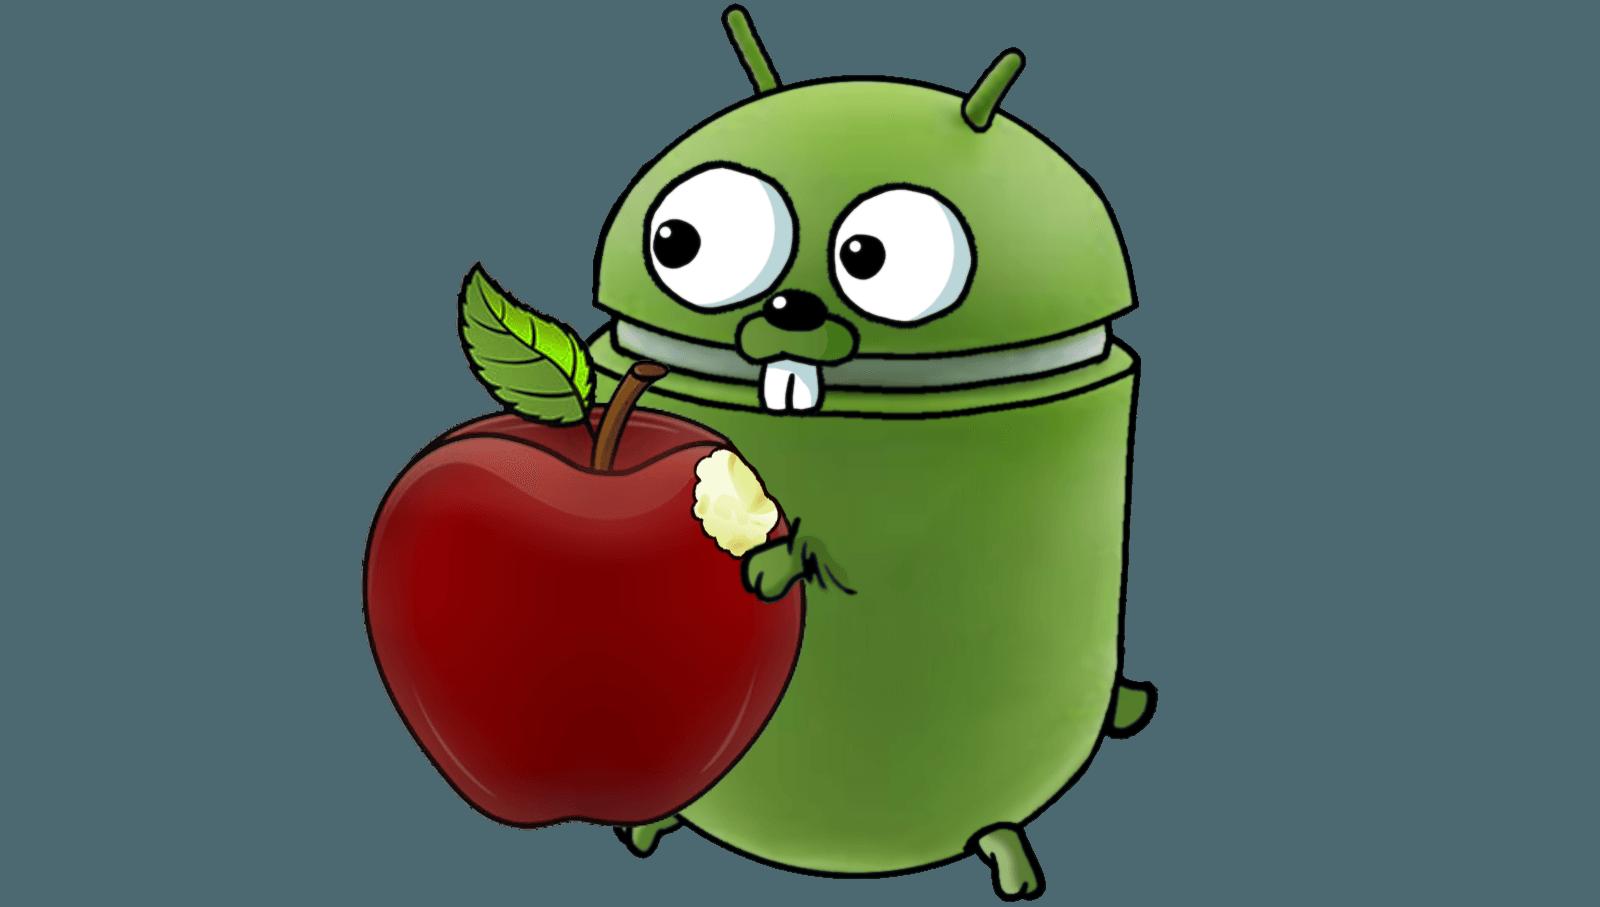 Разработка библиотеки для IOS/Android на Golang